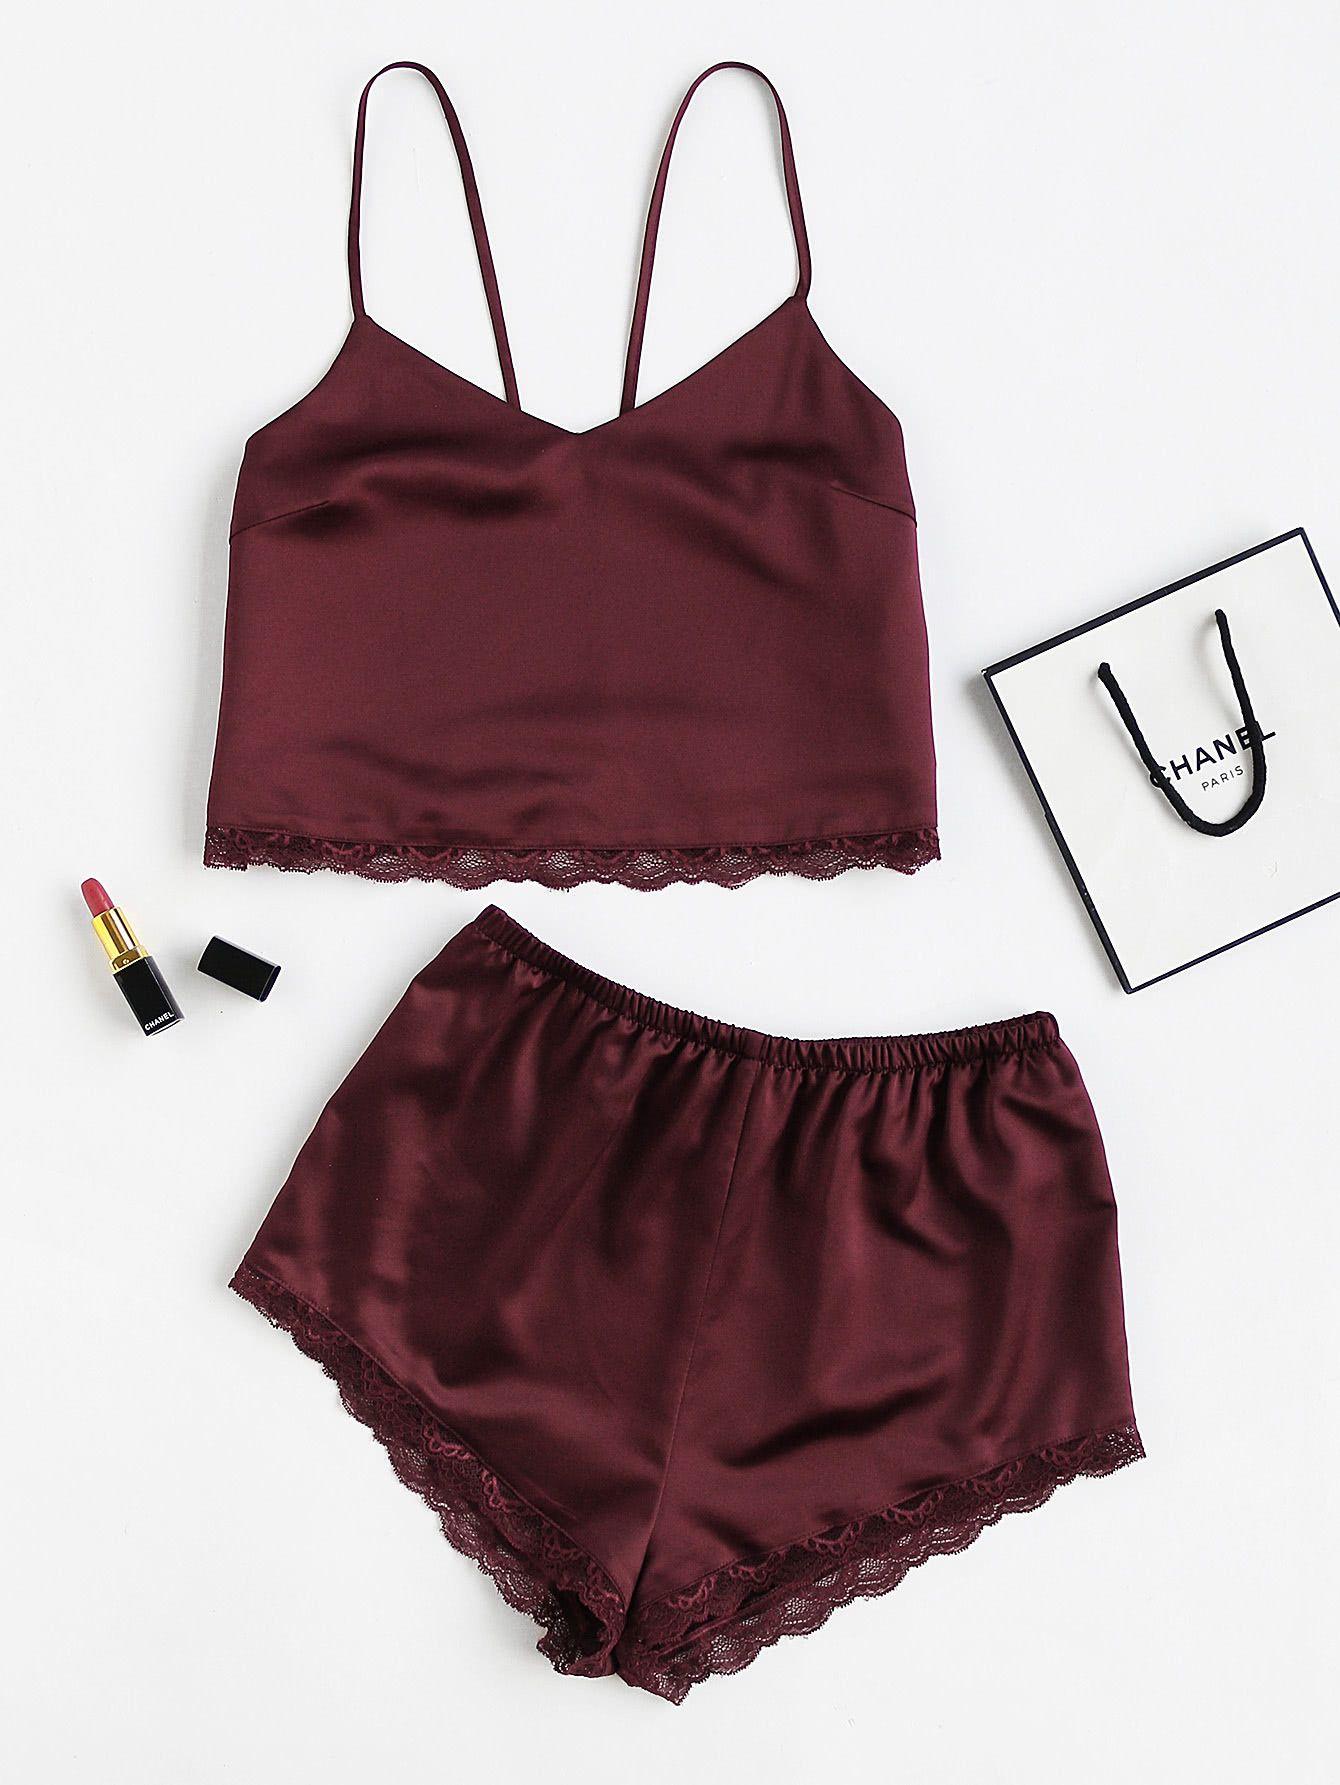 5b70e1ef115a Lace Trim Satin Cami And Shorts Pajama SetFor Women-romwe